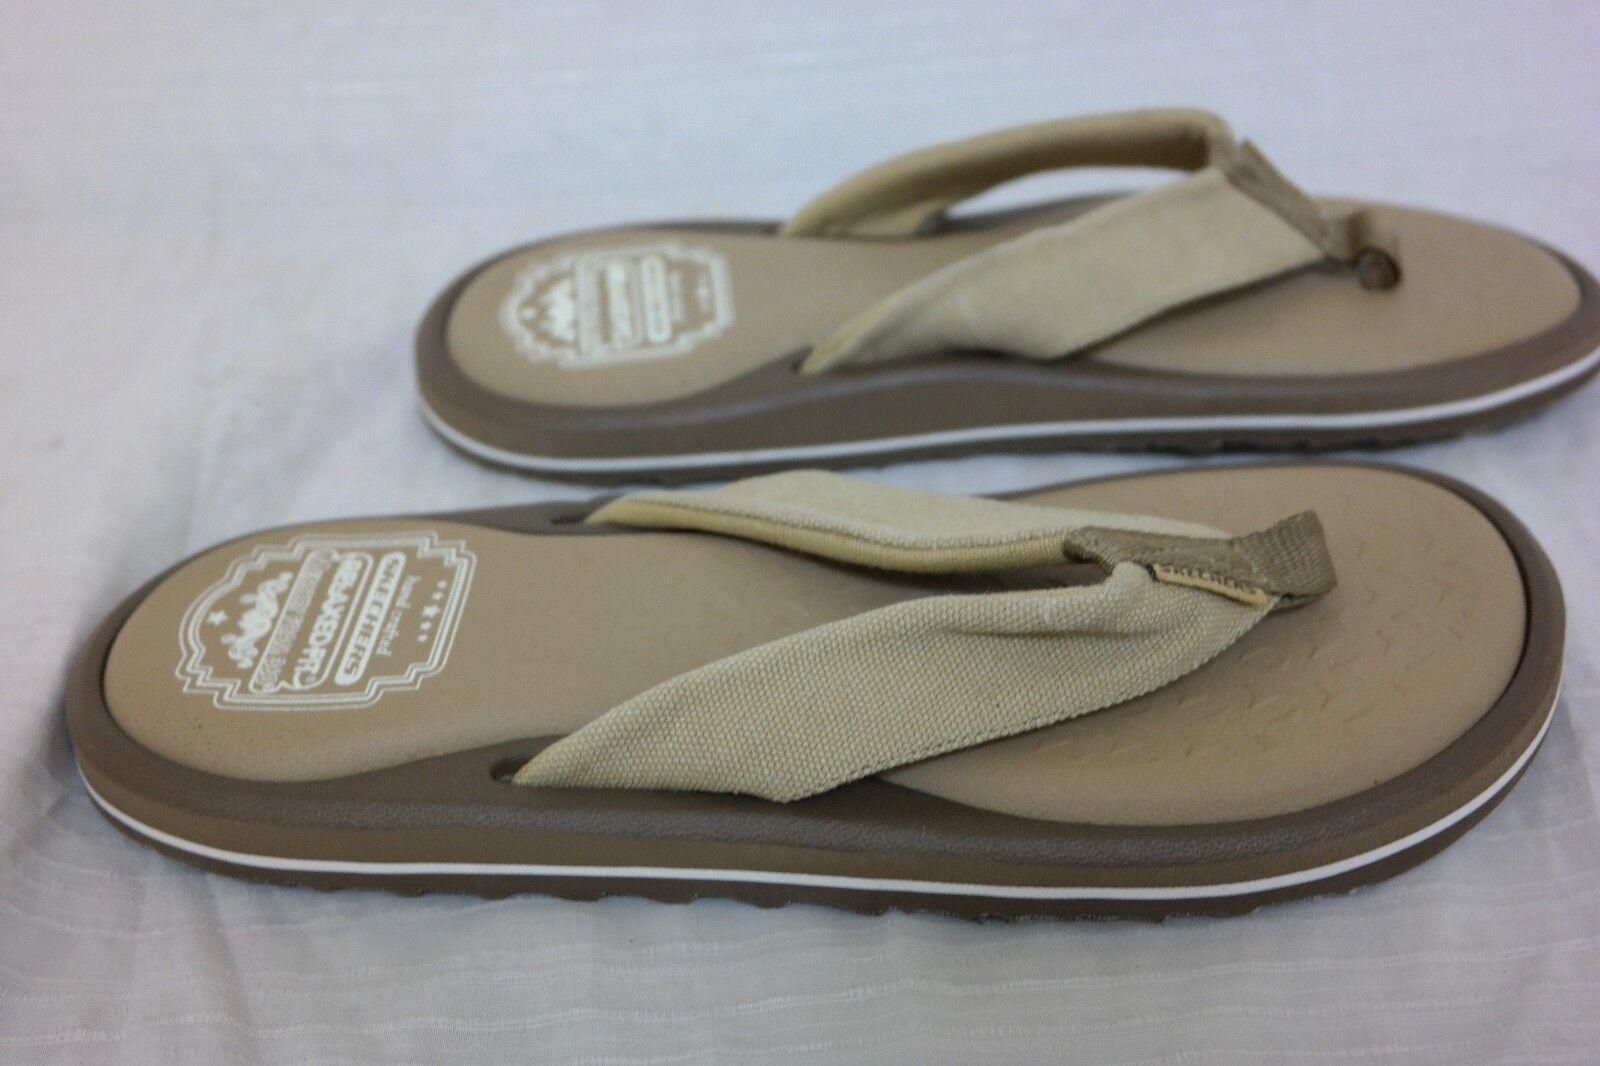 New! Men's RELAXED FIT: TANTRIC - NOWEN Flip Flop SN 64483  Brown/Tan F51 Seasonal clearance sale